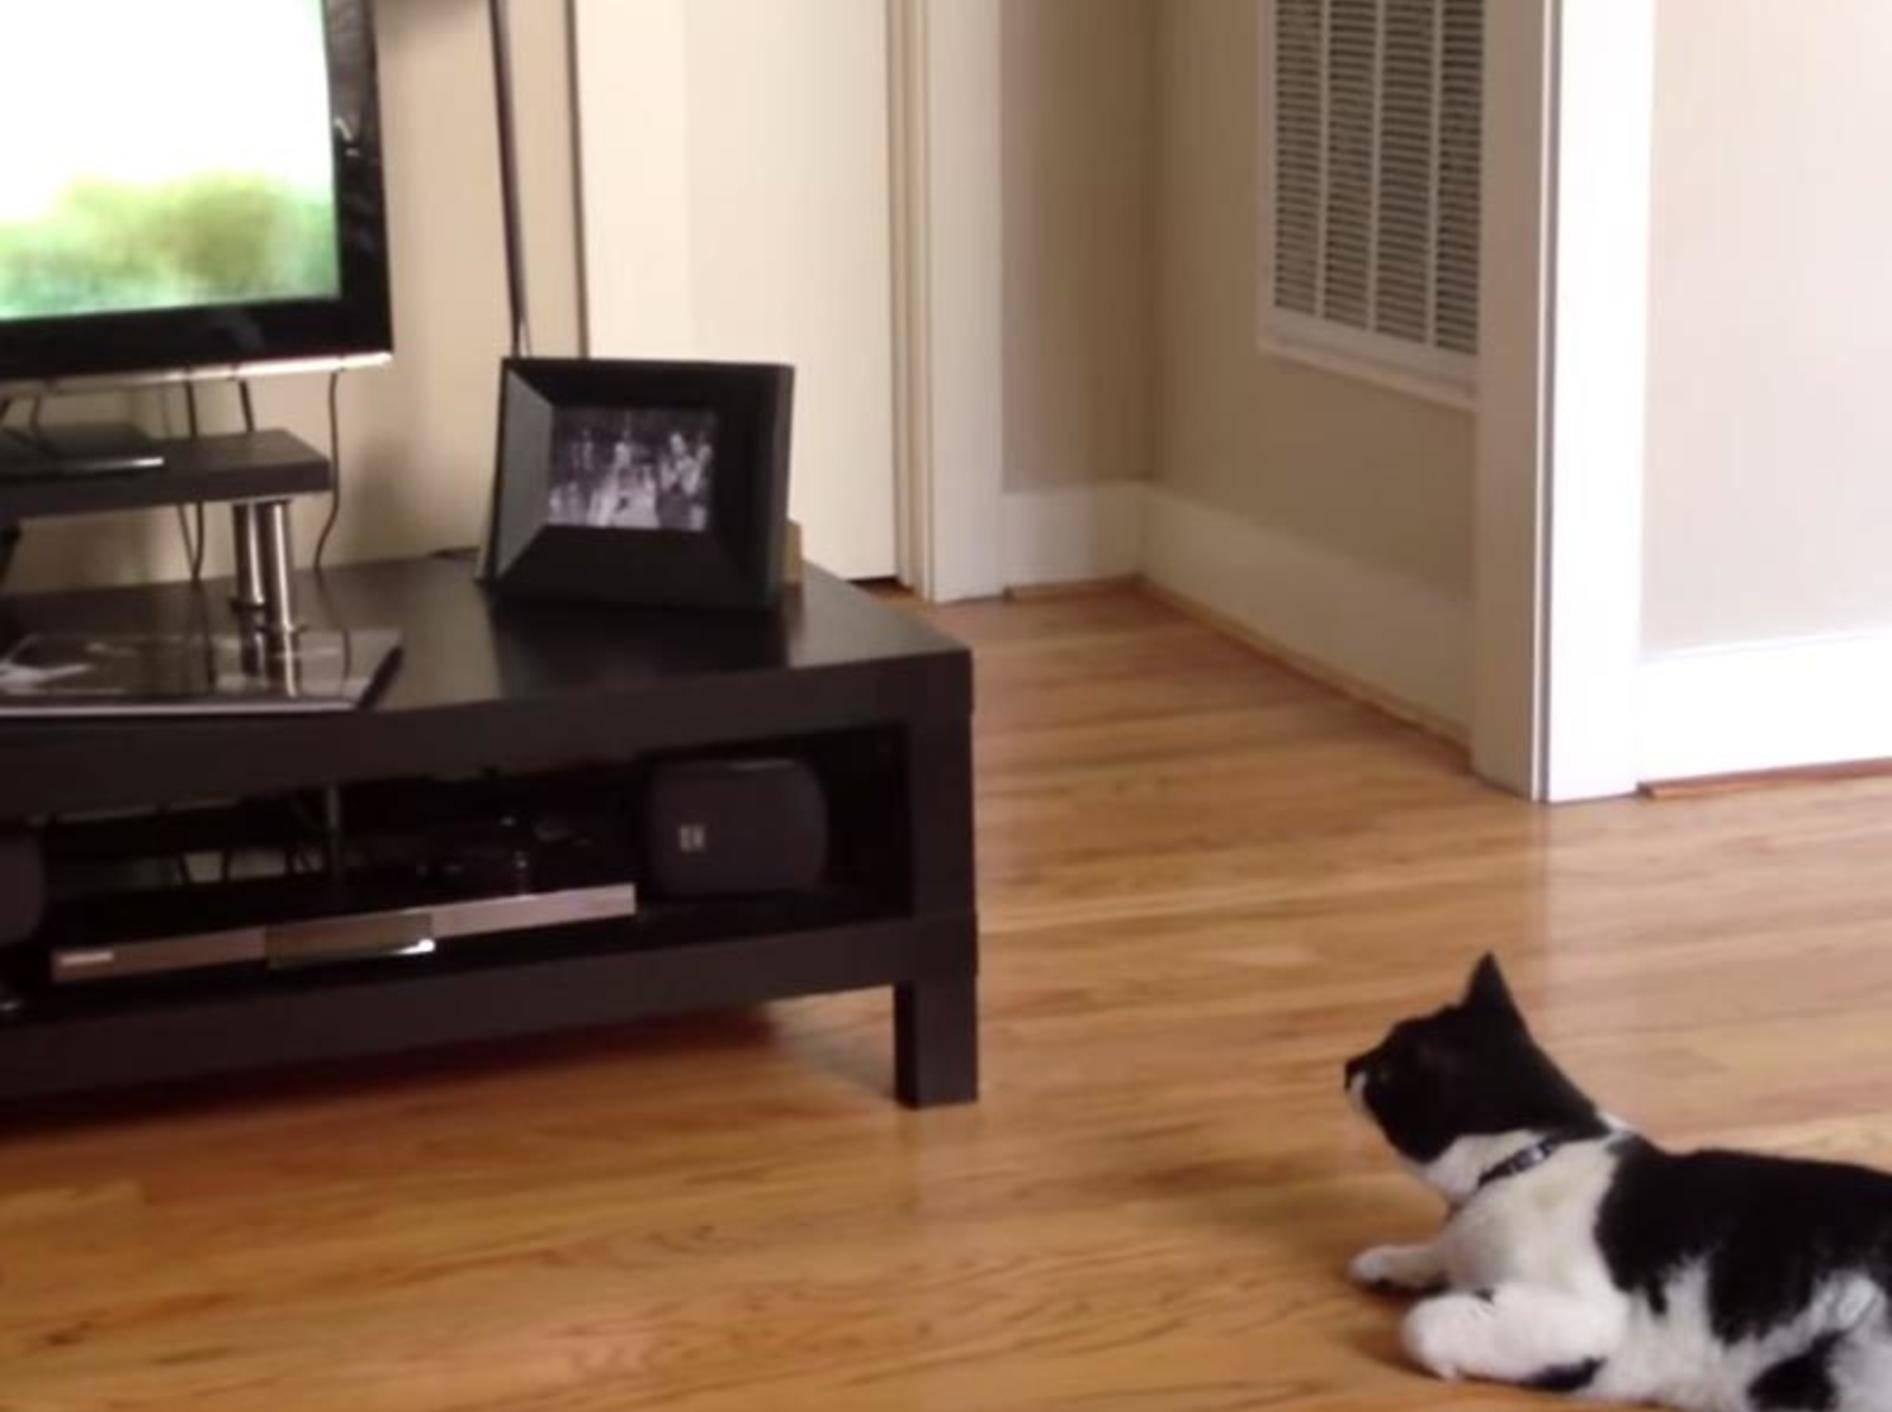 Süße Katze liebt Dokusendungen im TV – Bild: Youtube / CE54R